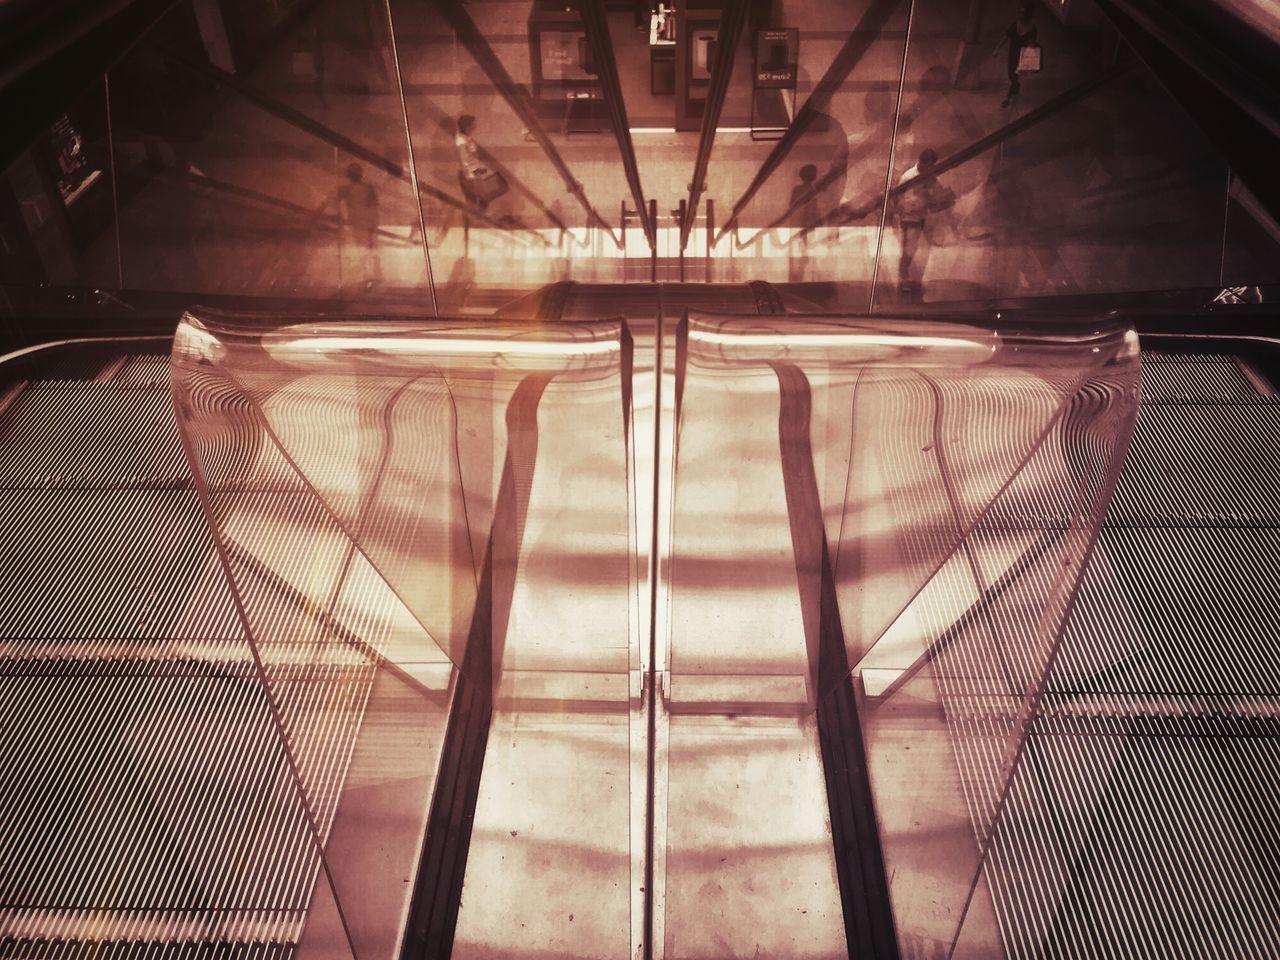 CLOSE-UP OF ILLUMINATED WINDOW OF EMPTY RAILROAD STATION